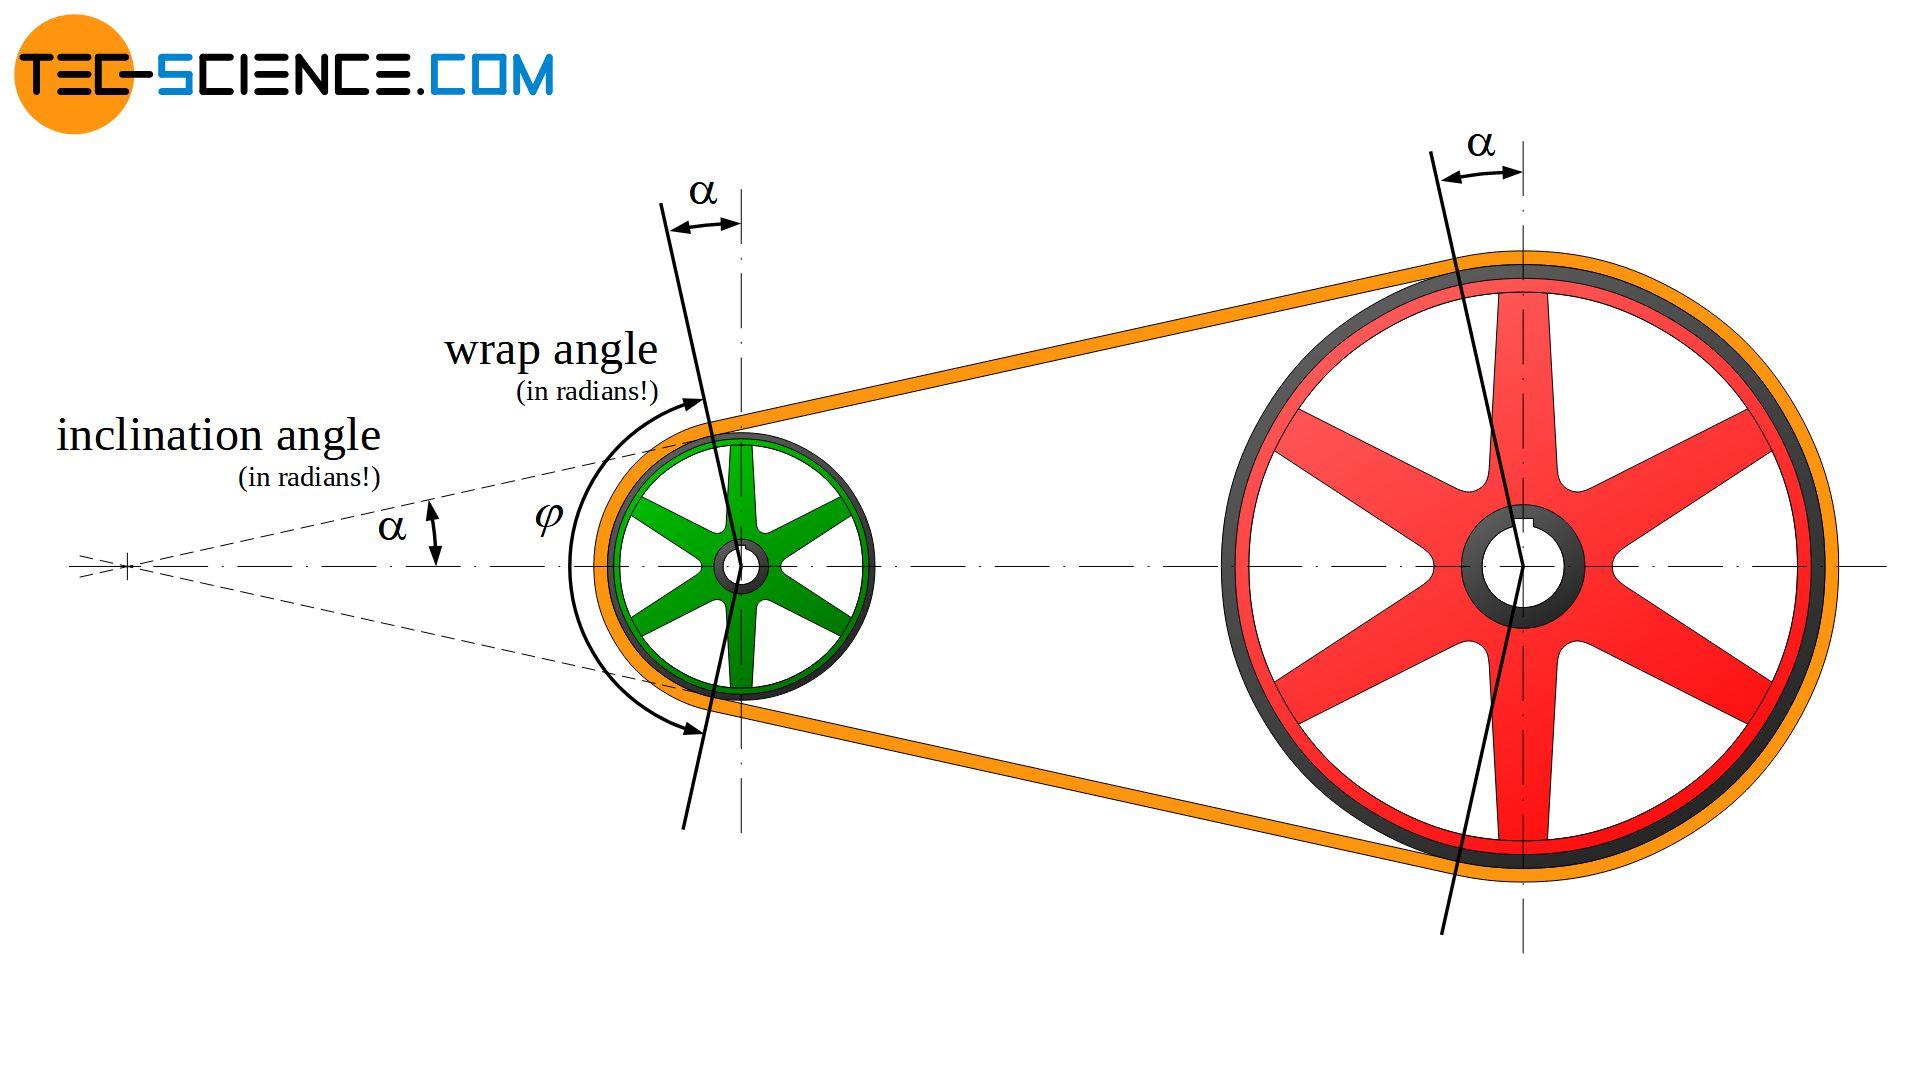 Calculation of belt length